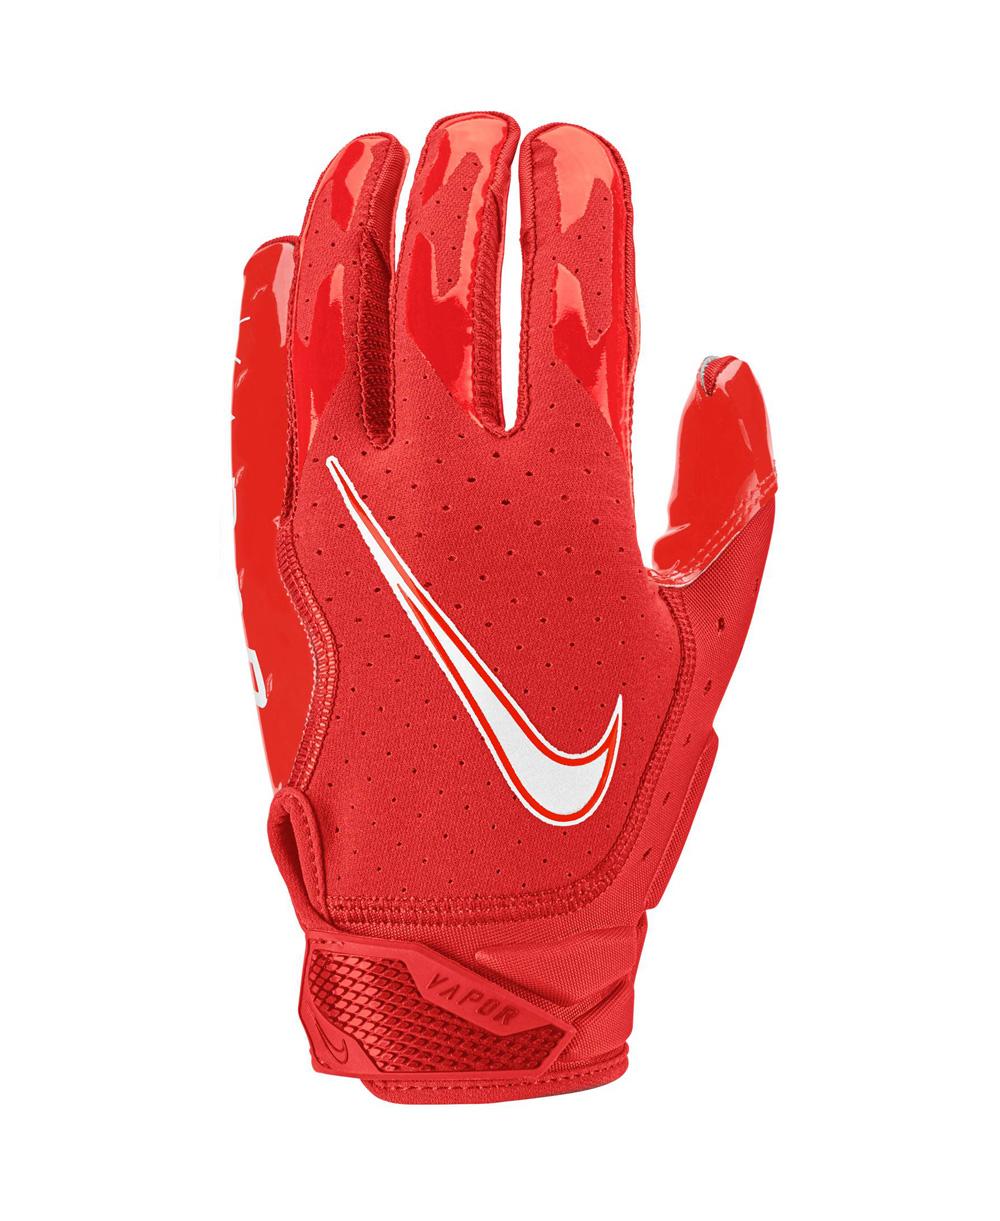 Vapor Jet 6 Gants Football Américain Homme Red